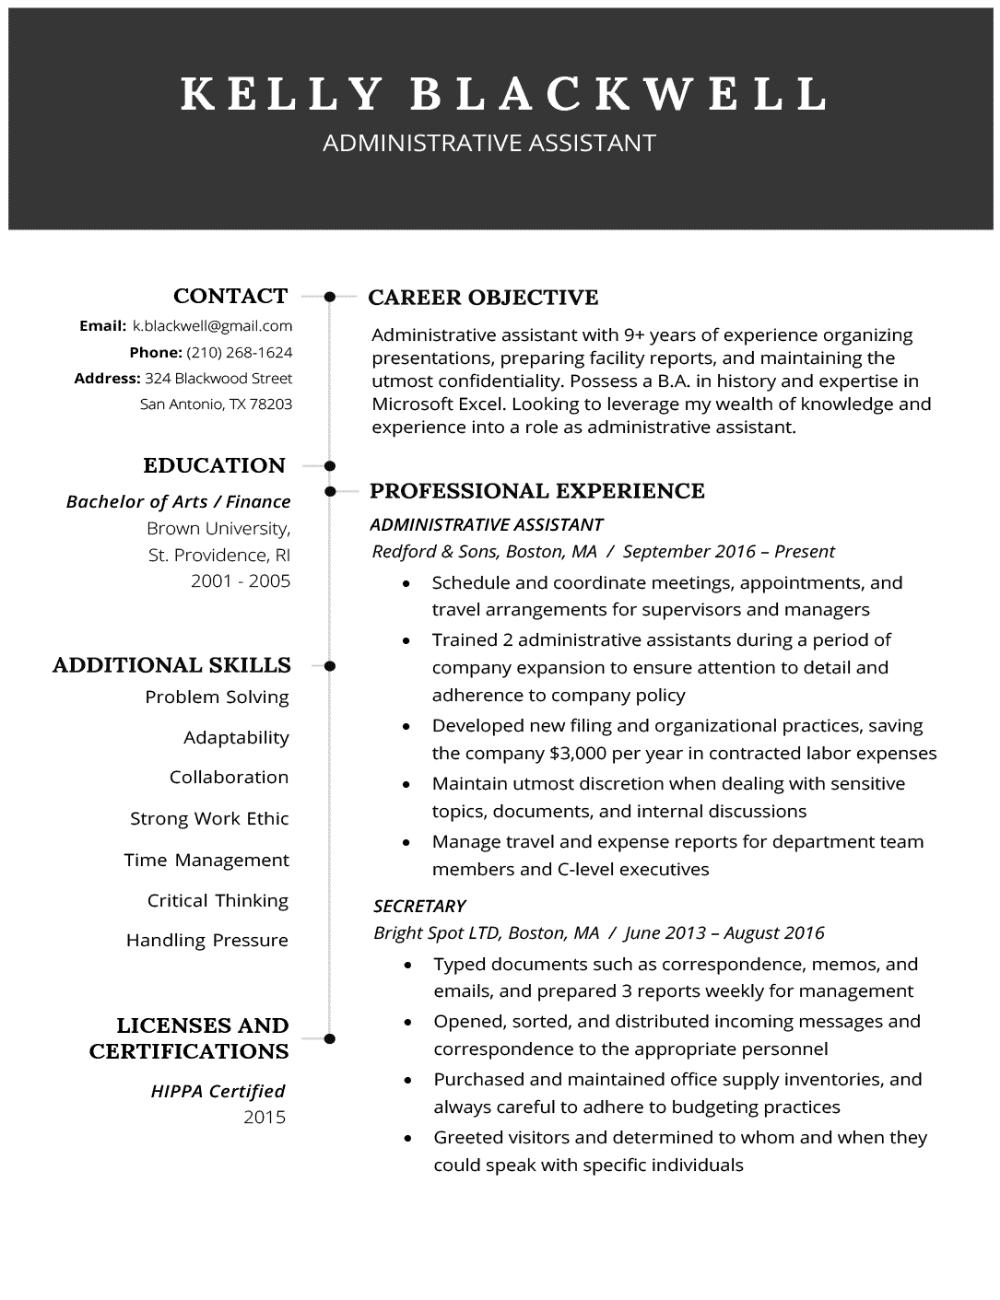 Resume Builder Resume builder, Free resume builder, Resume